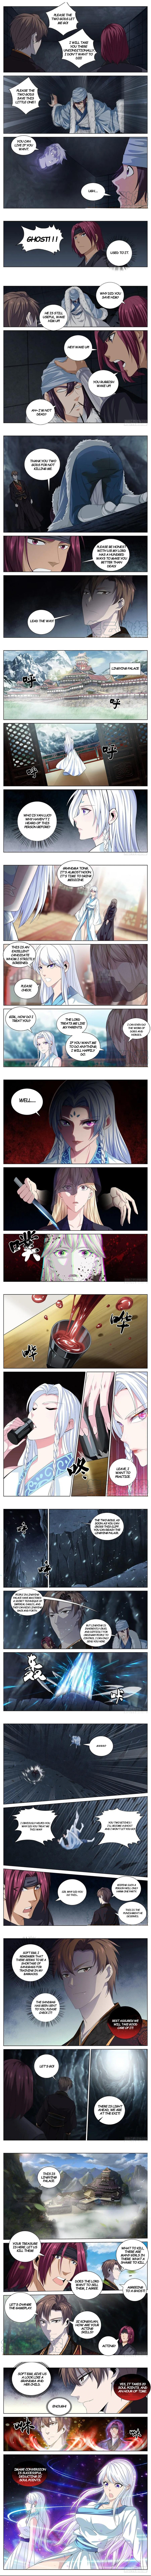 https://manga.mangadogs.com/comics/pic4/29/39645/2178753/ec2f62e241edfe09f6f625ead7943772.jpg Page 1